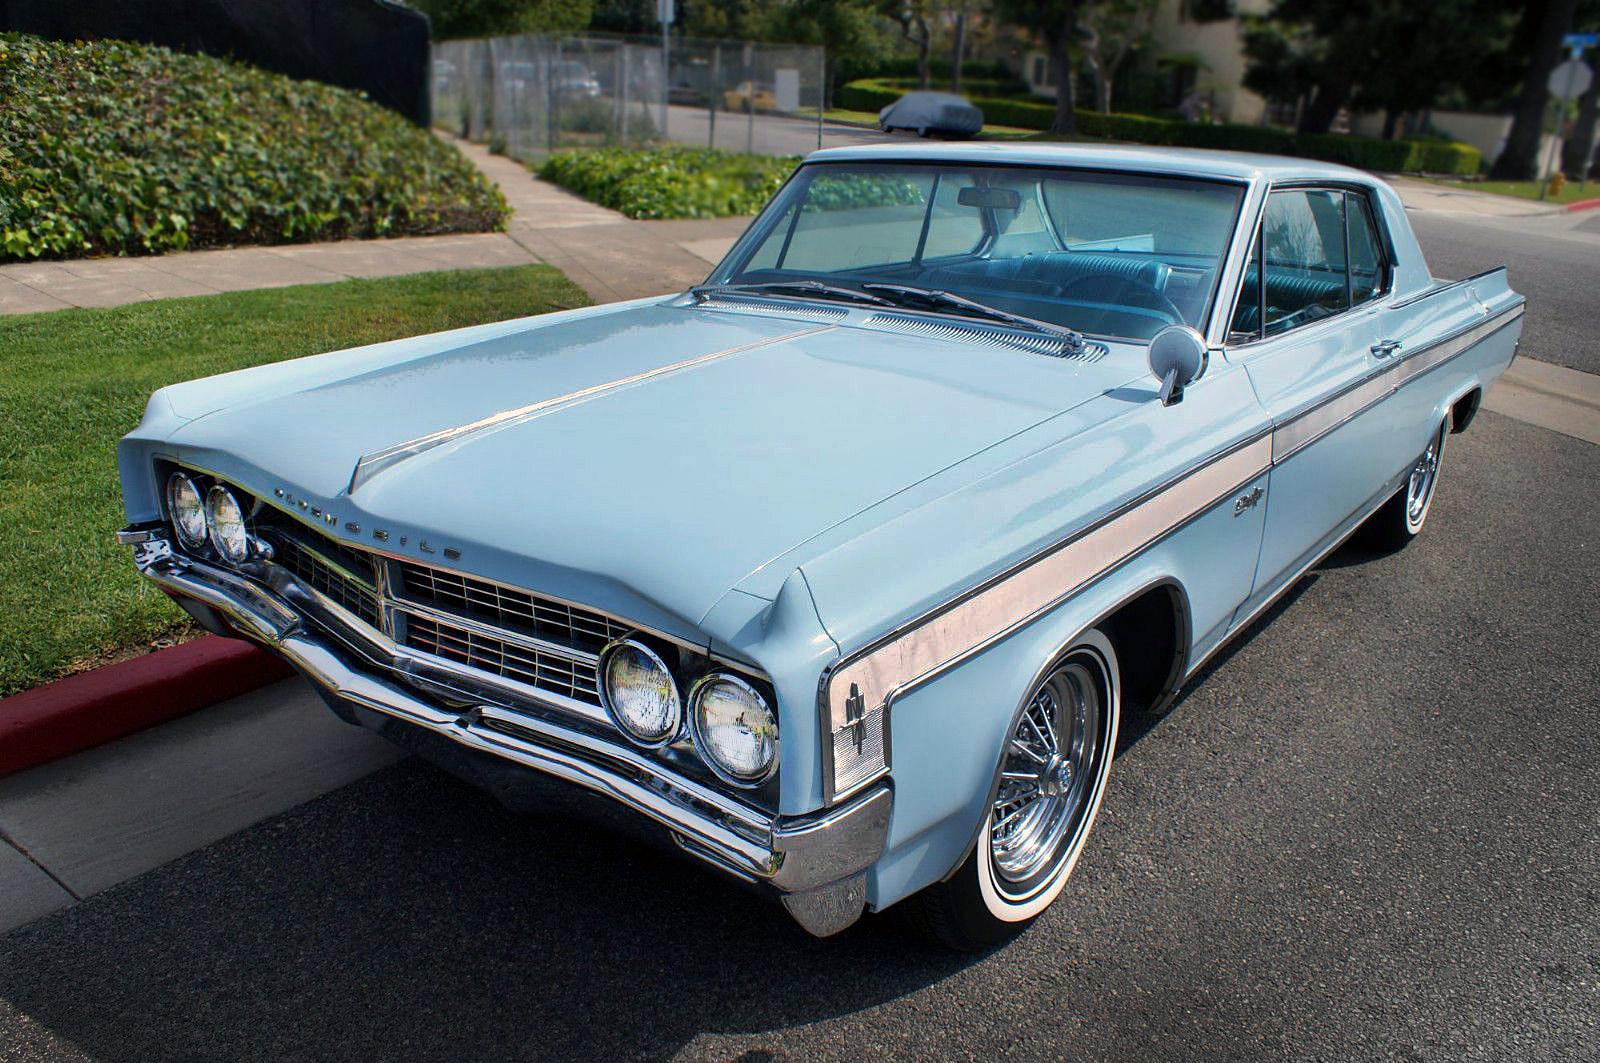 1963OldsmobileStarfire11